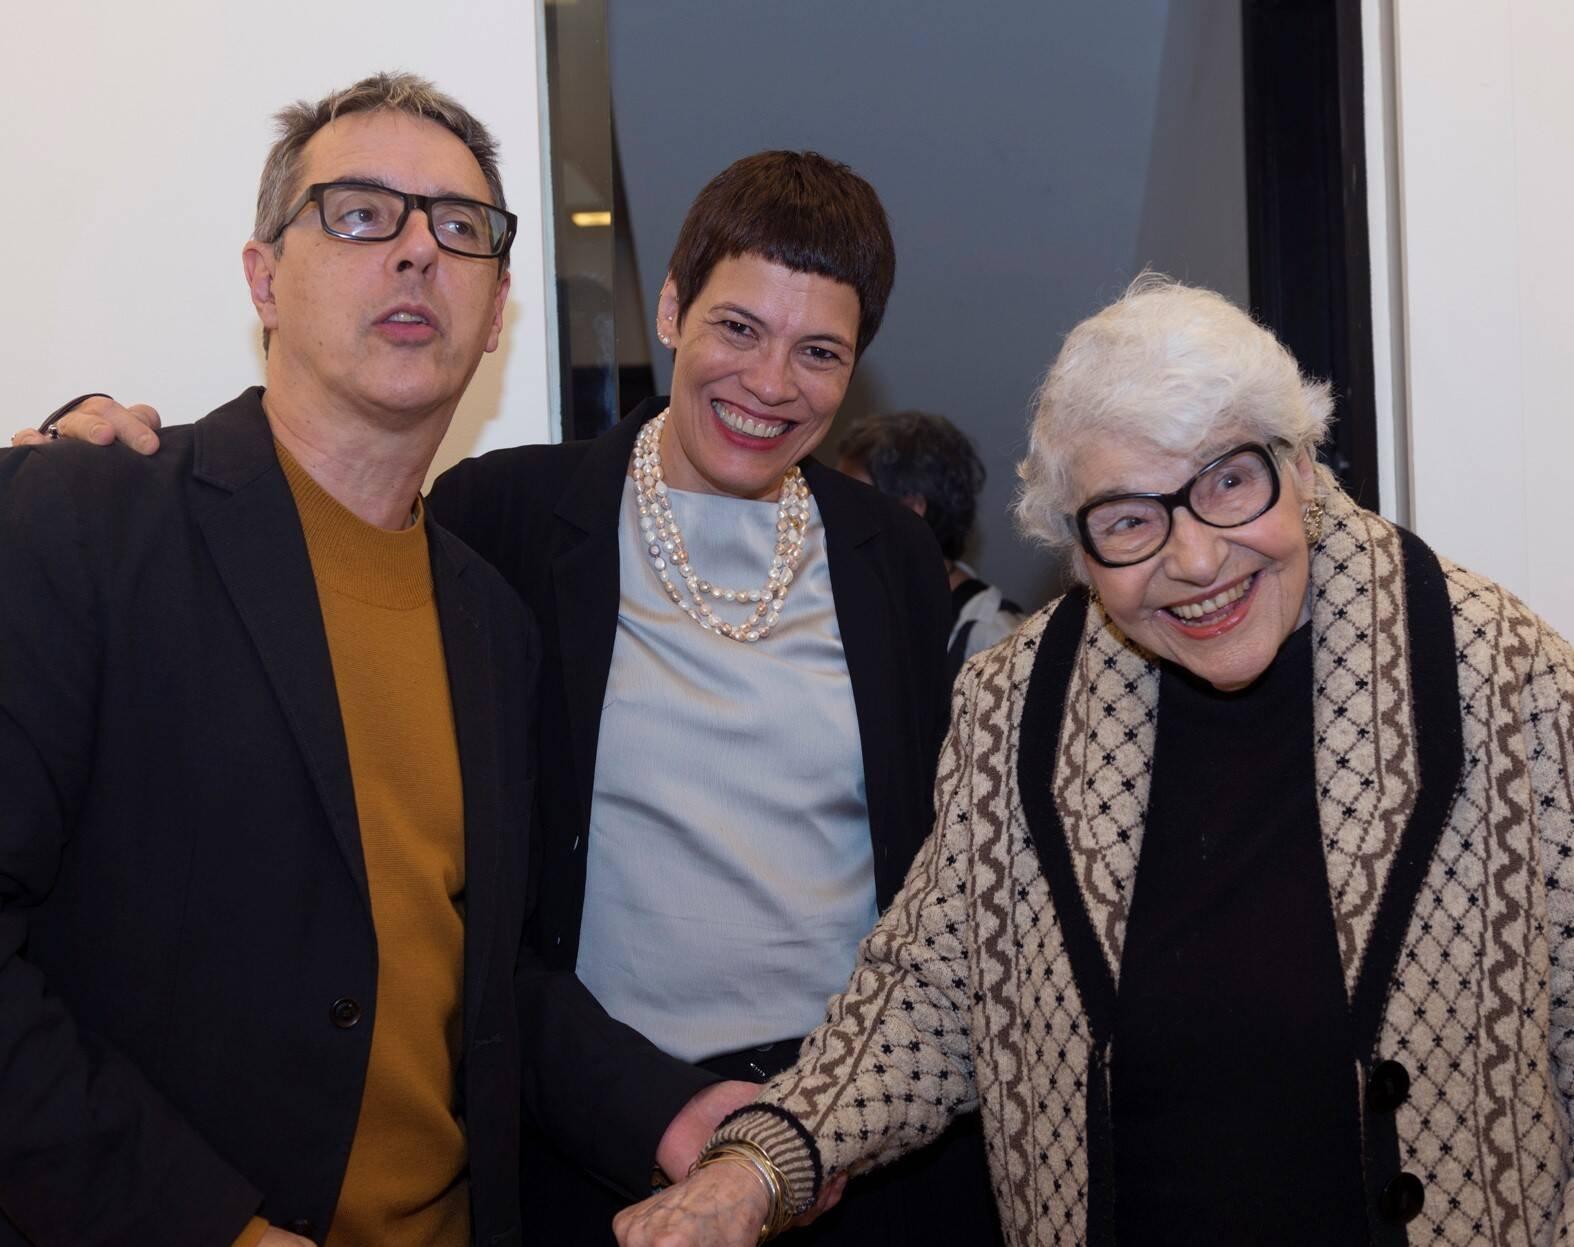 Nuno Ramos, Sandra Ramos e Carmen Lucia Roquette-Pinto /Foto: Diana Sandes